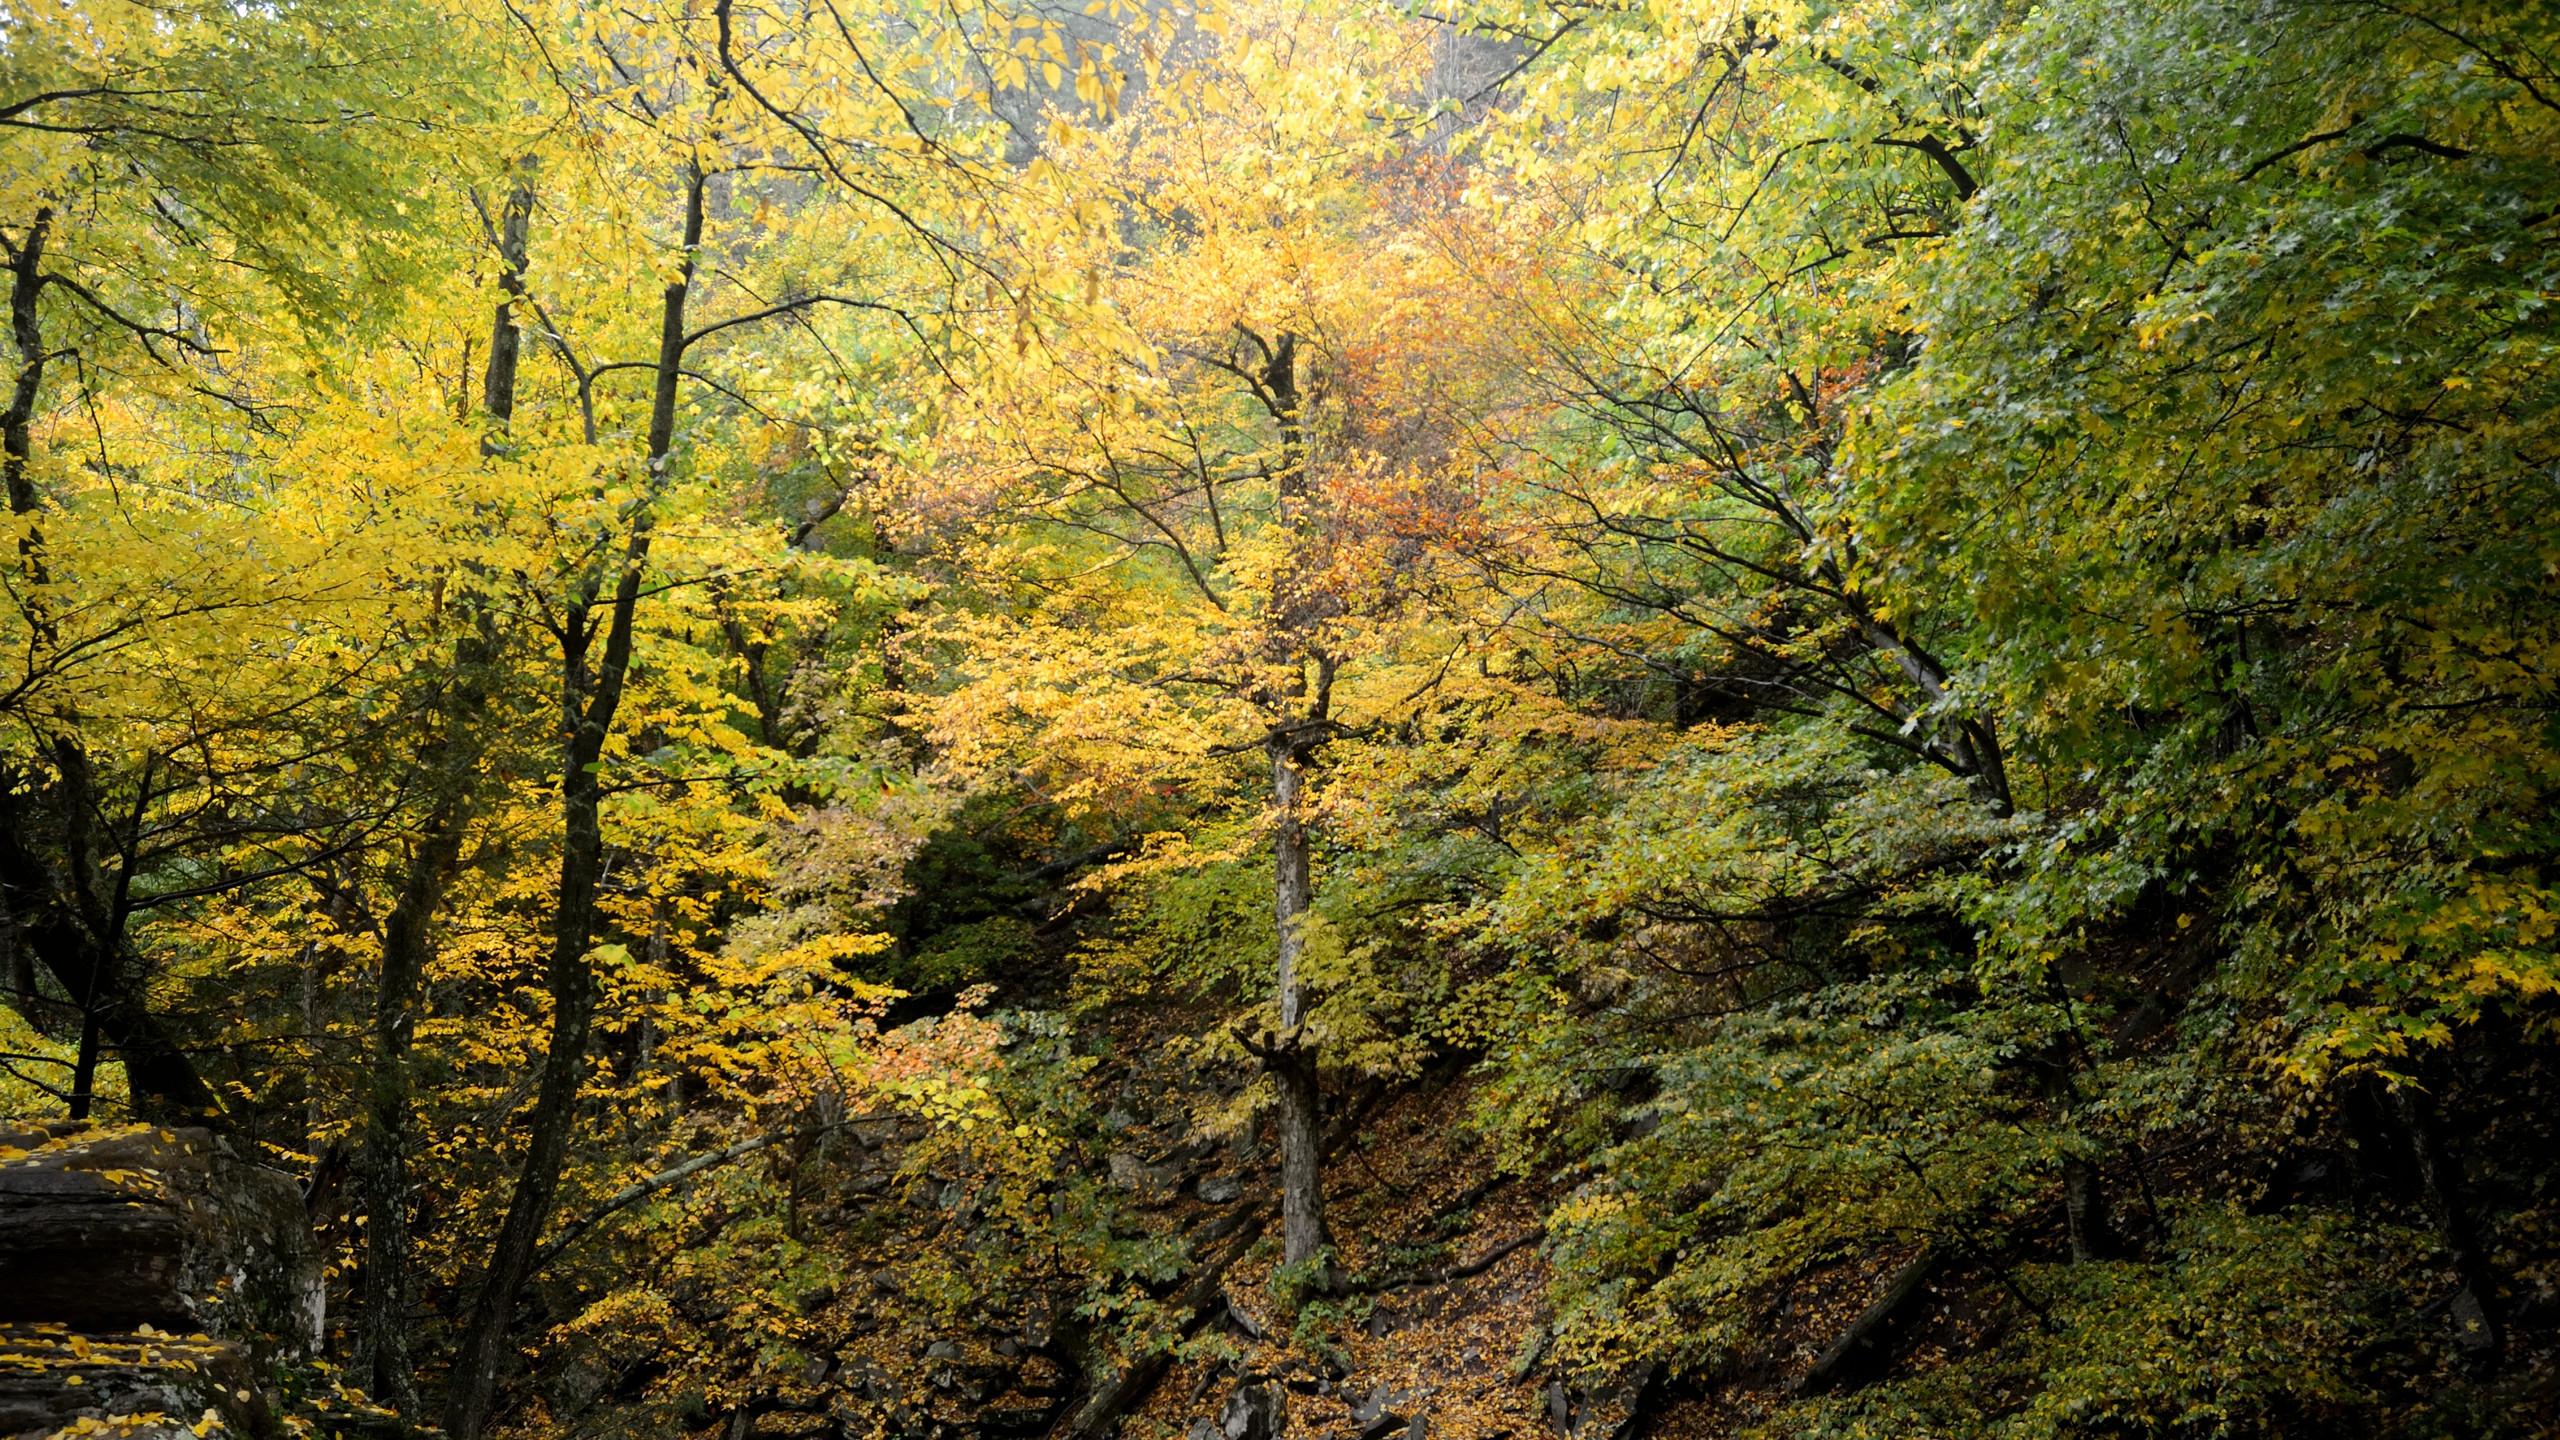 Fall in Kaaterskill Clove